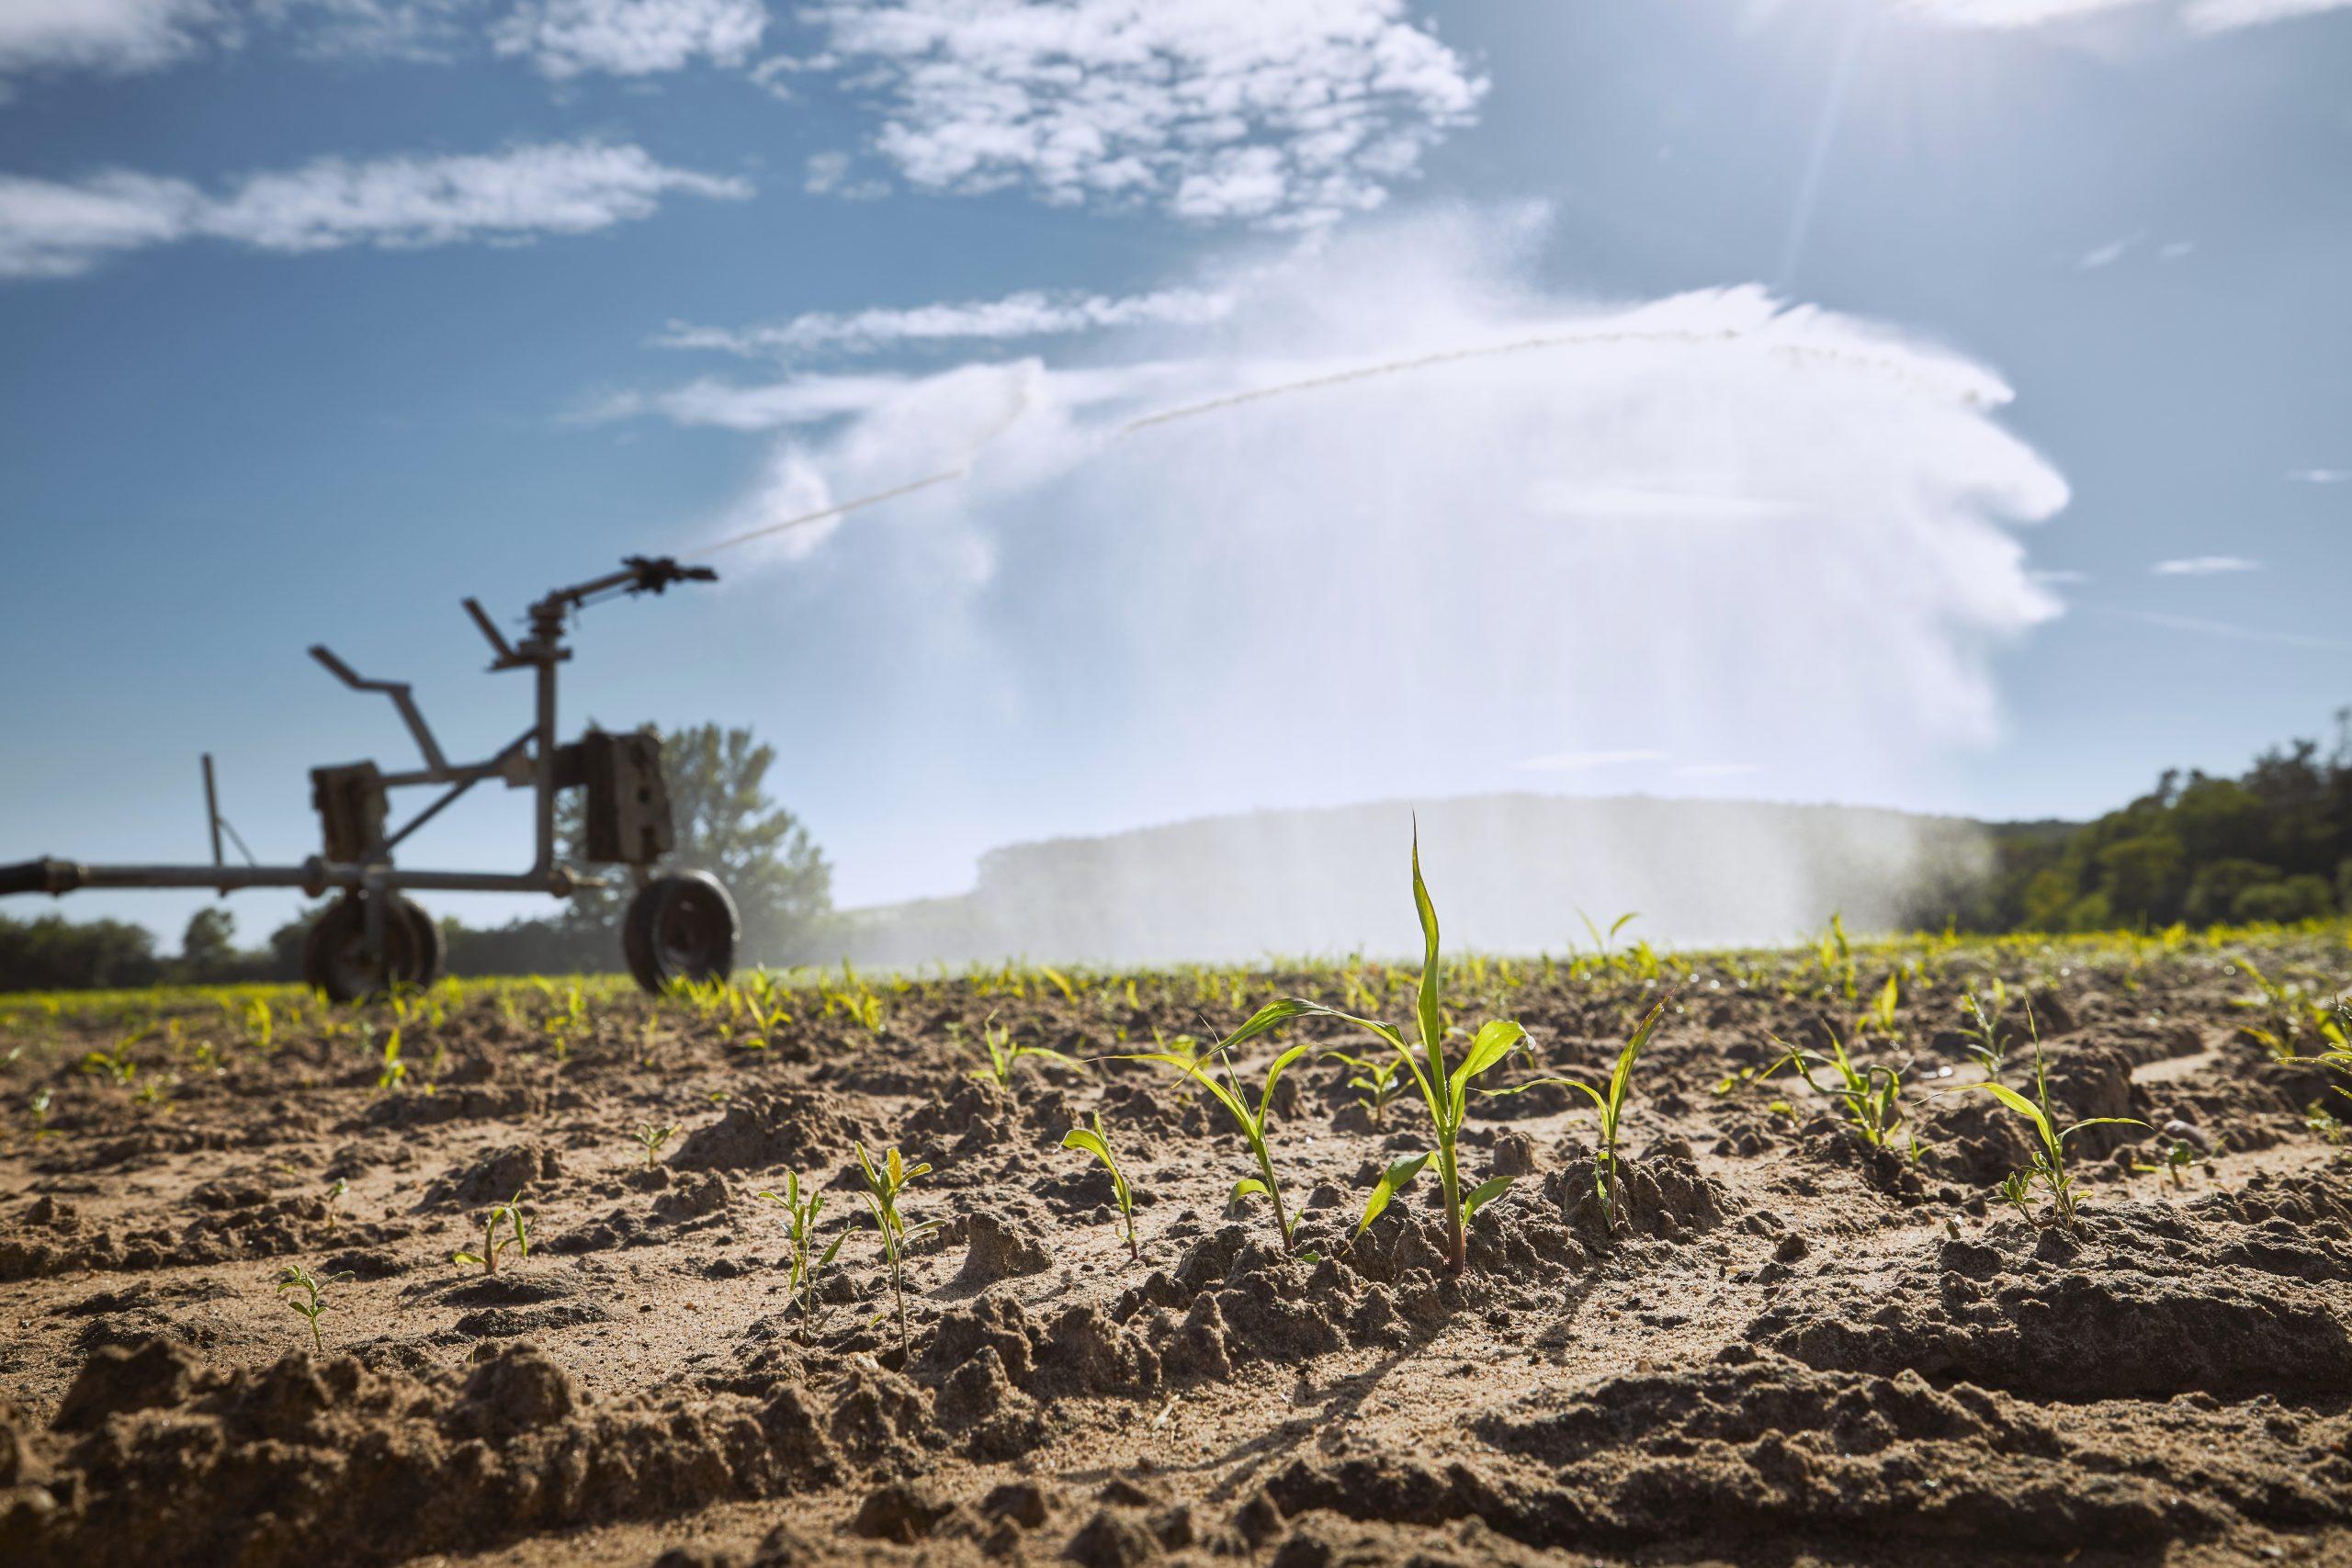 Agricultural irrigation machine